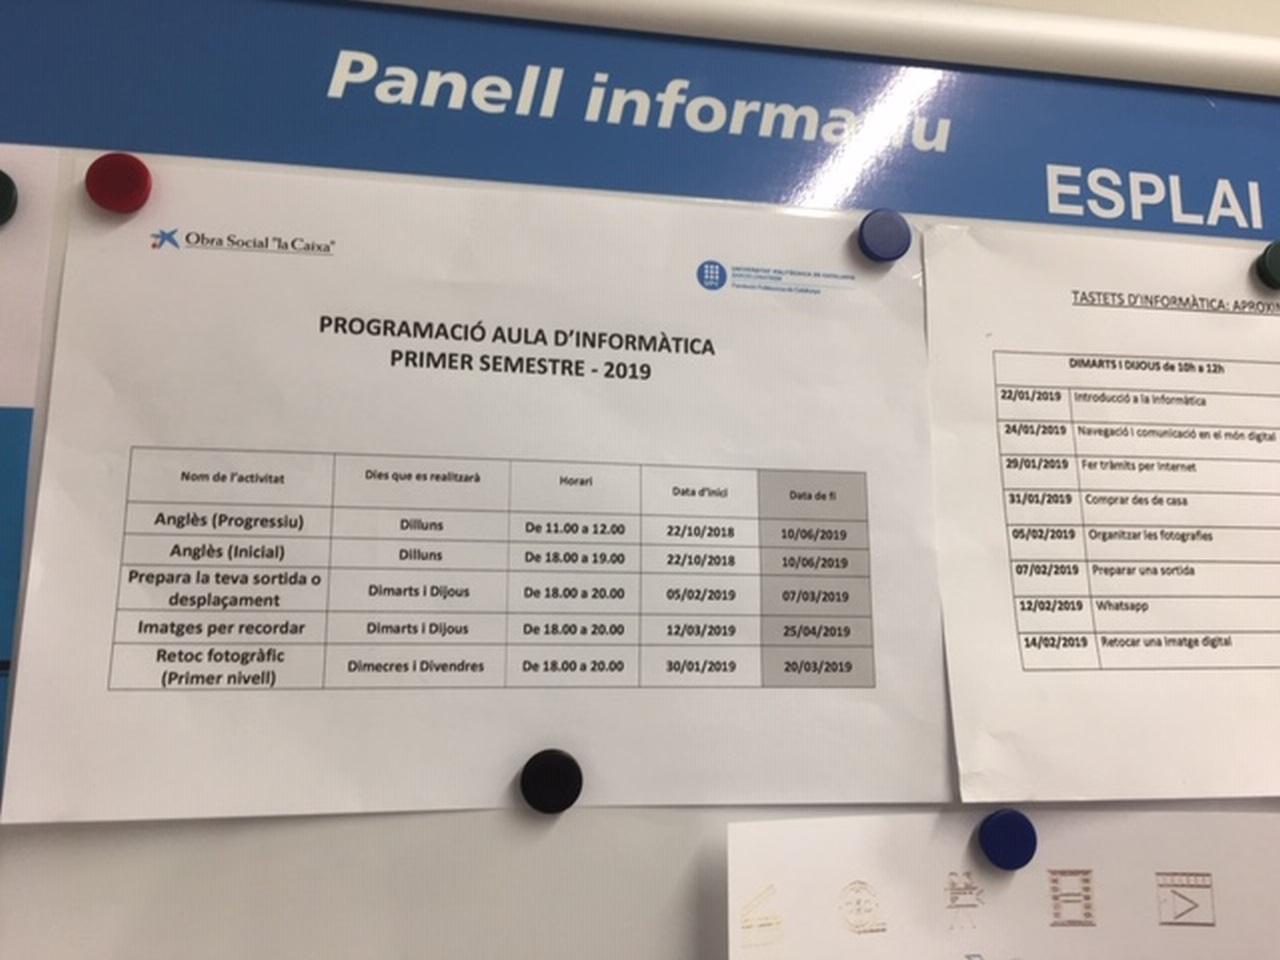 panellinformatiu2